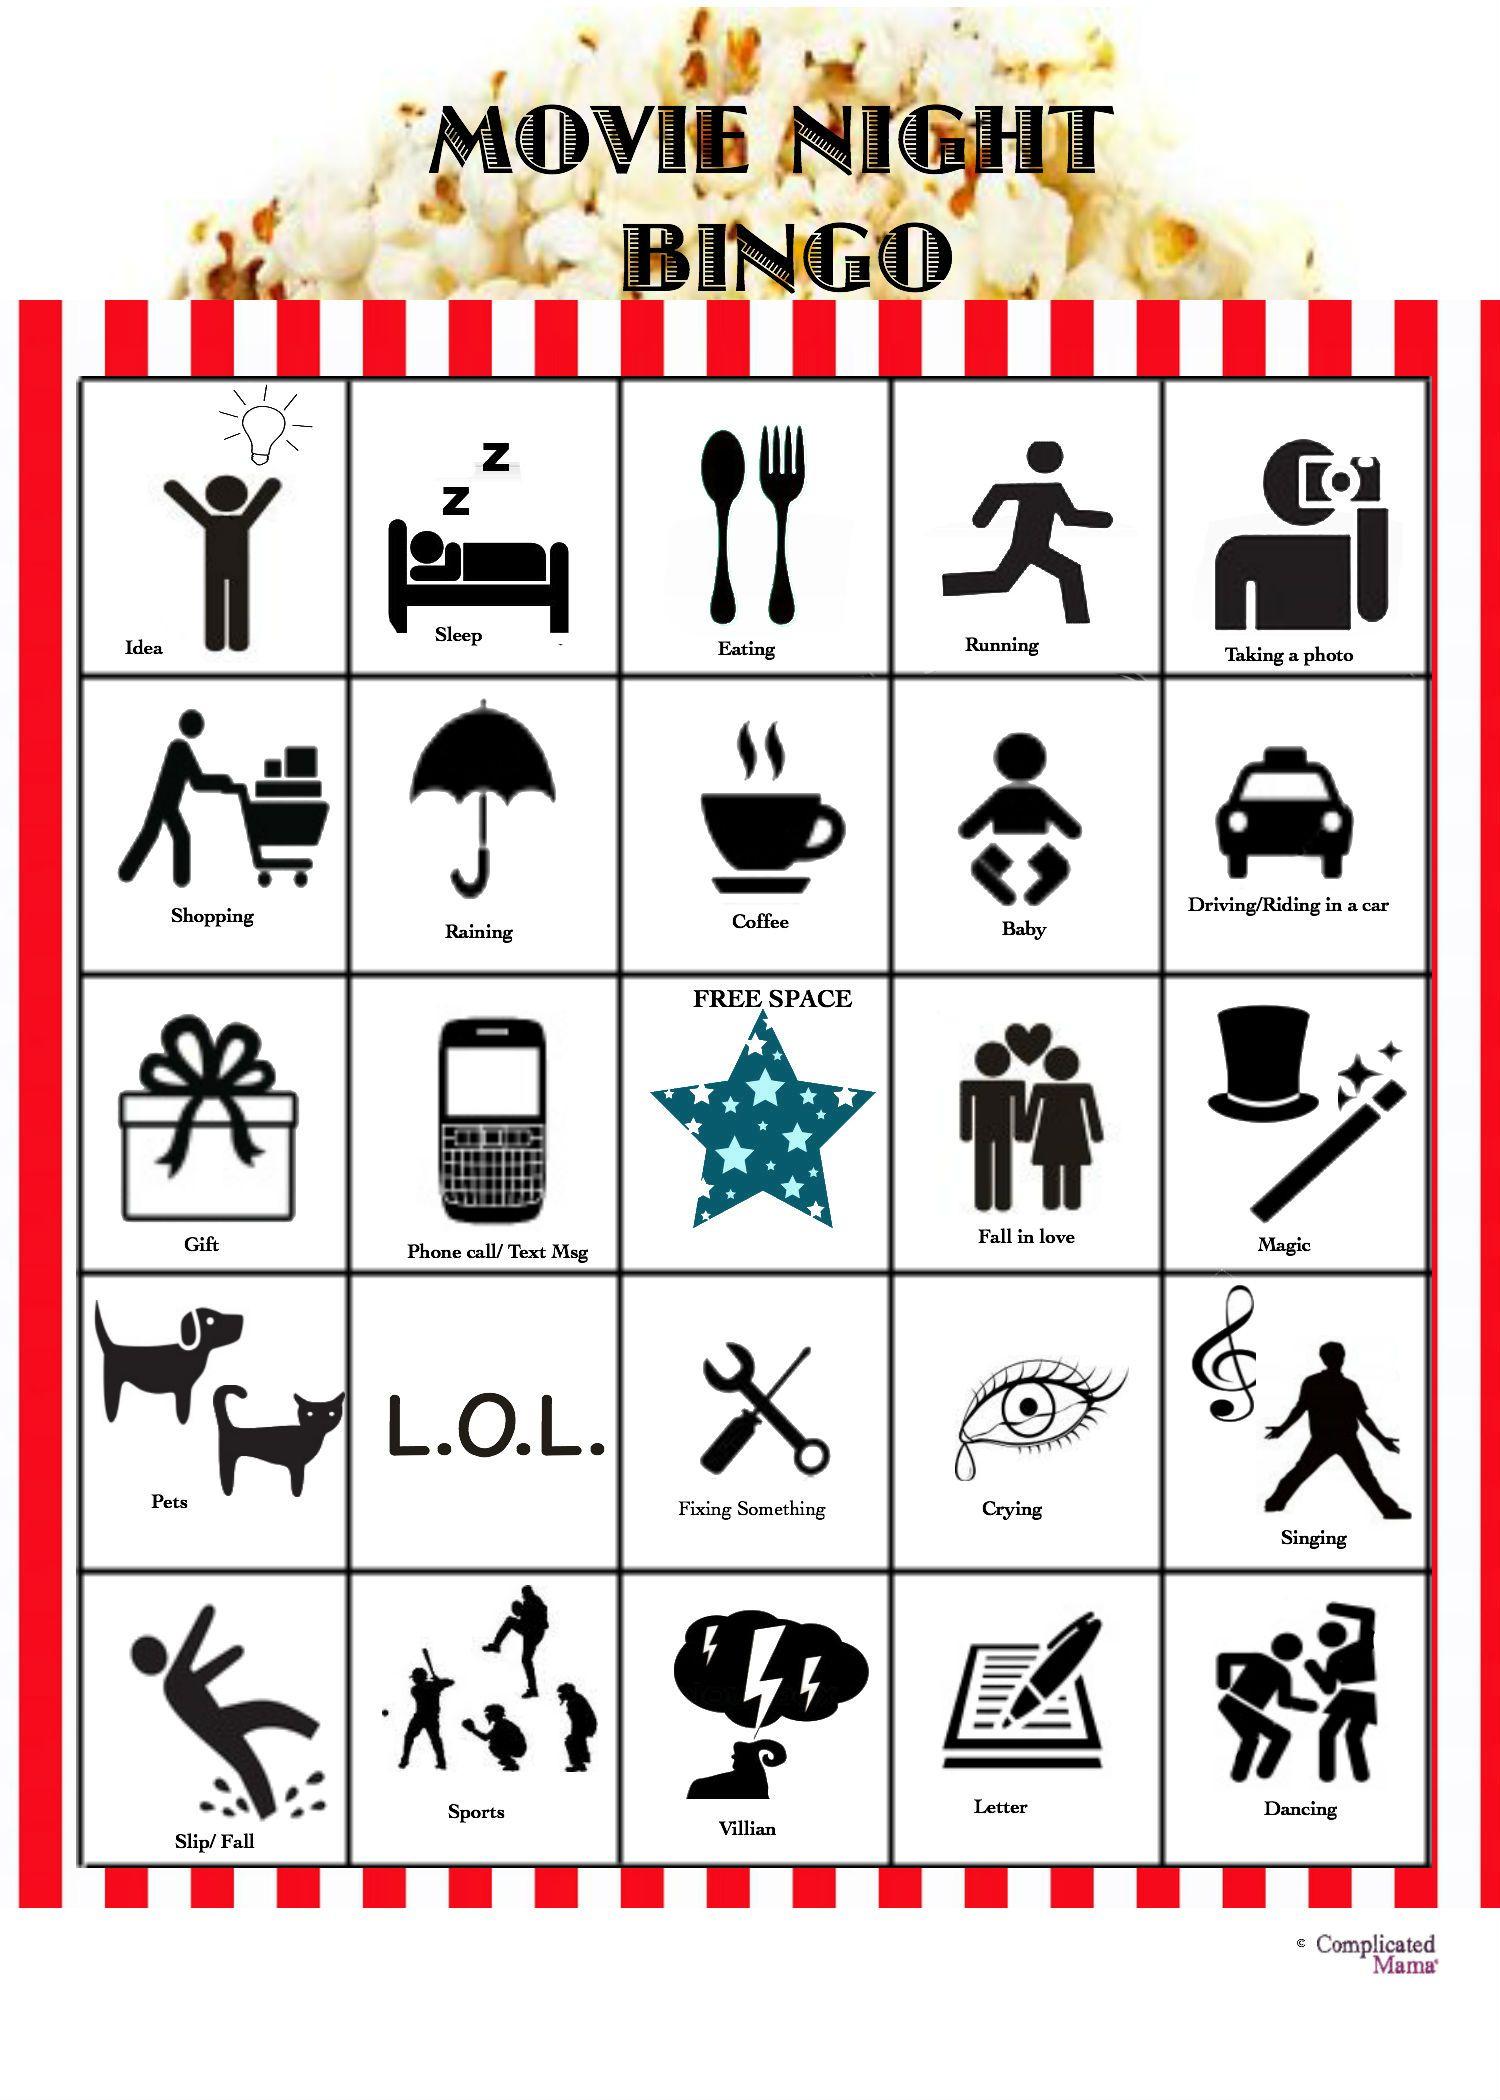 Family Movie Night Bingo With Free Printable Bingo Game